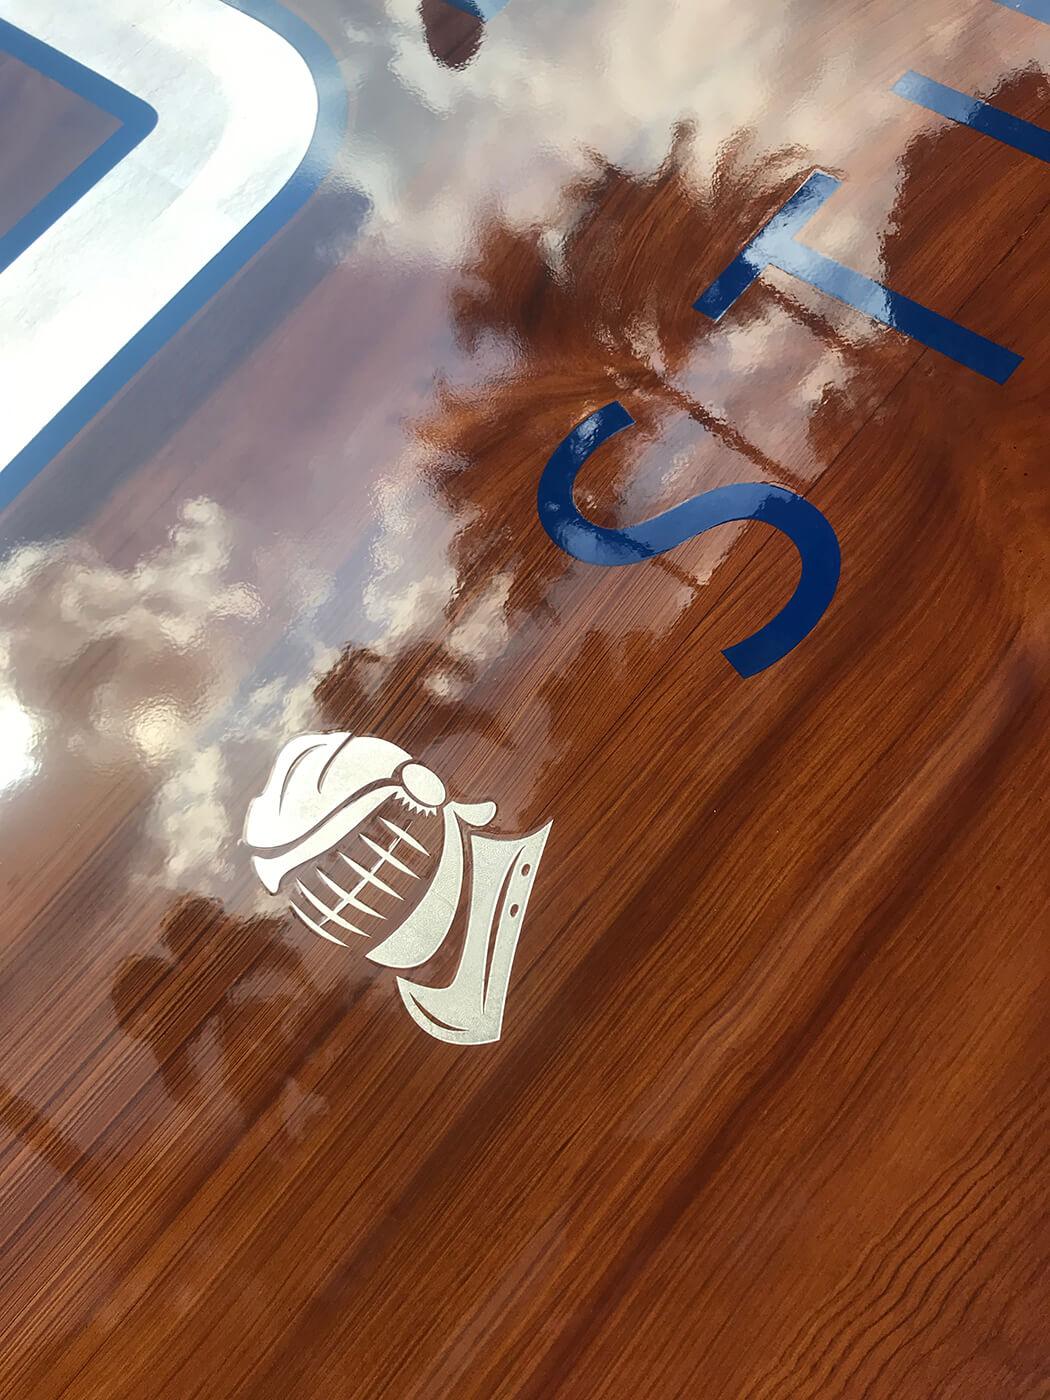 aluminator, stuart florida, boat transom, lettering, name design, graphic